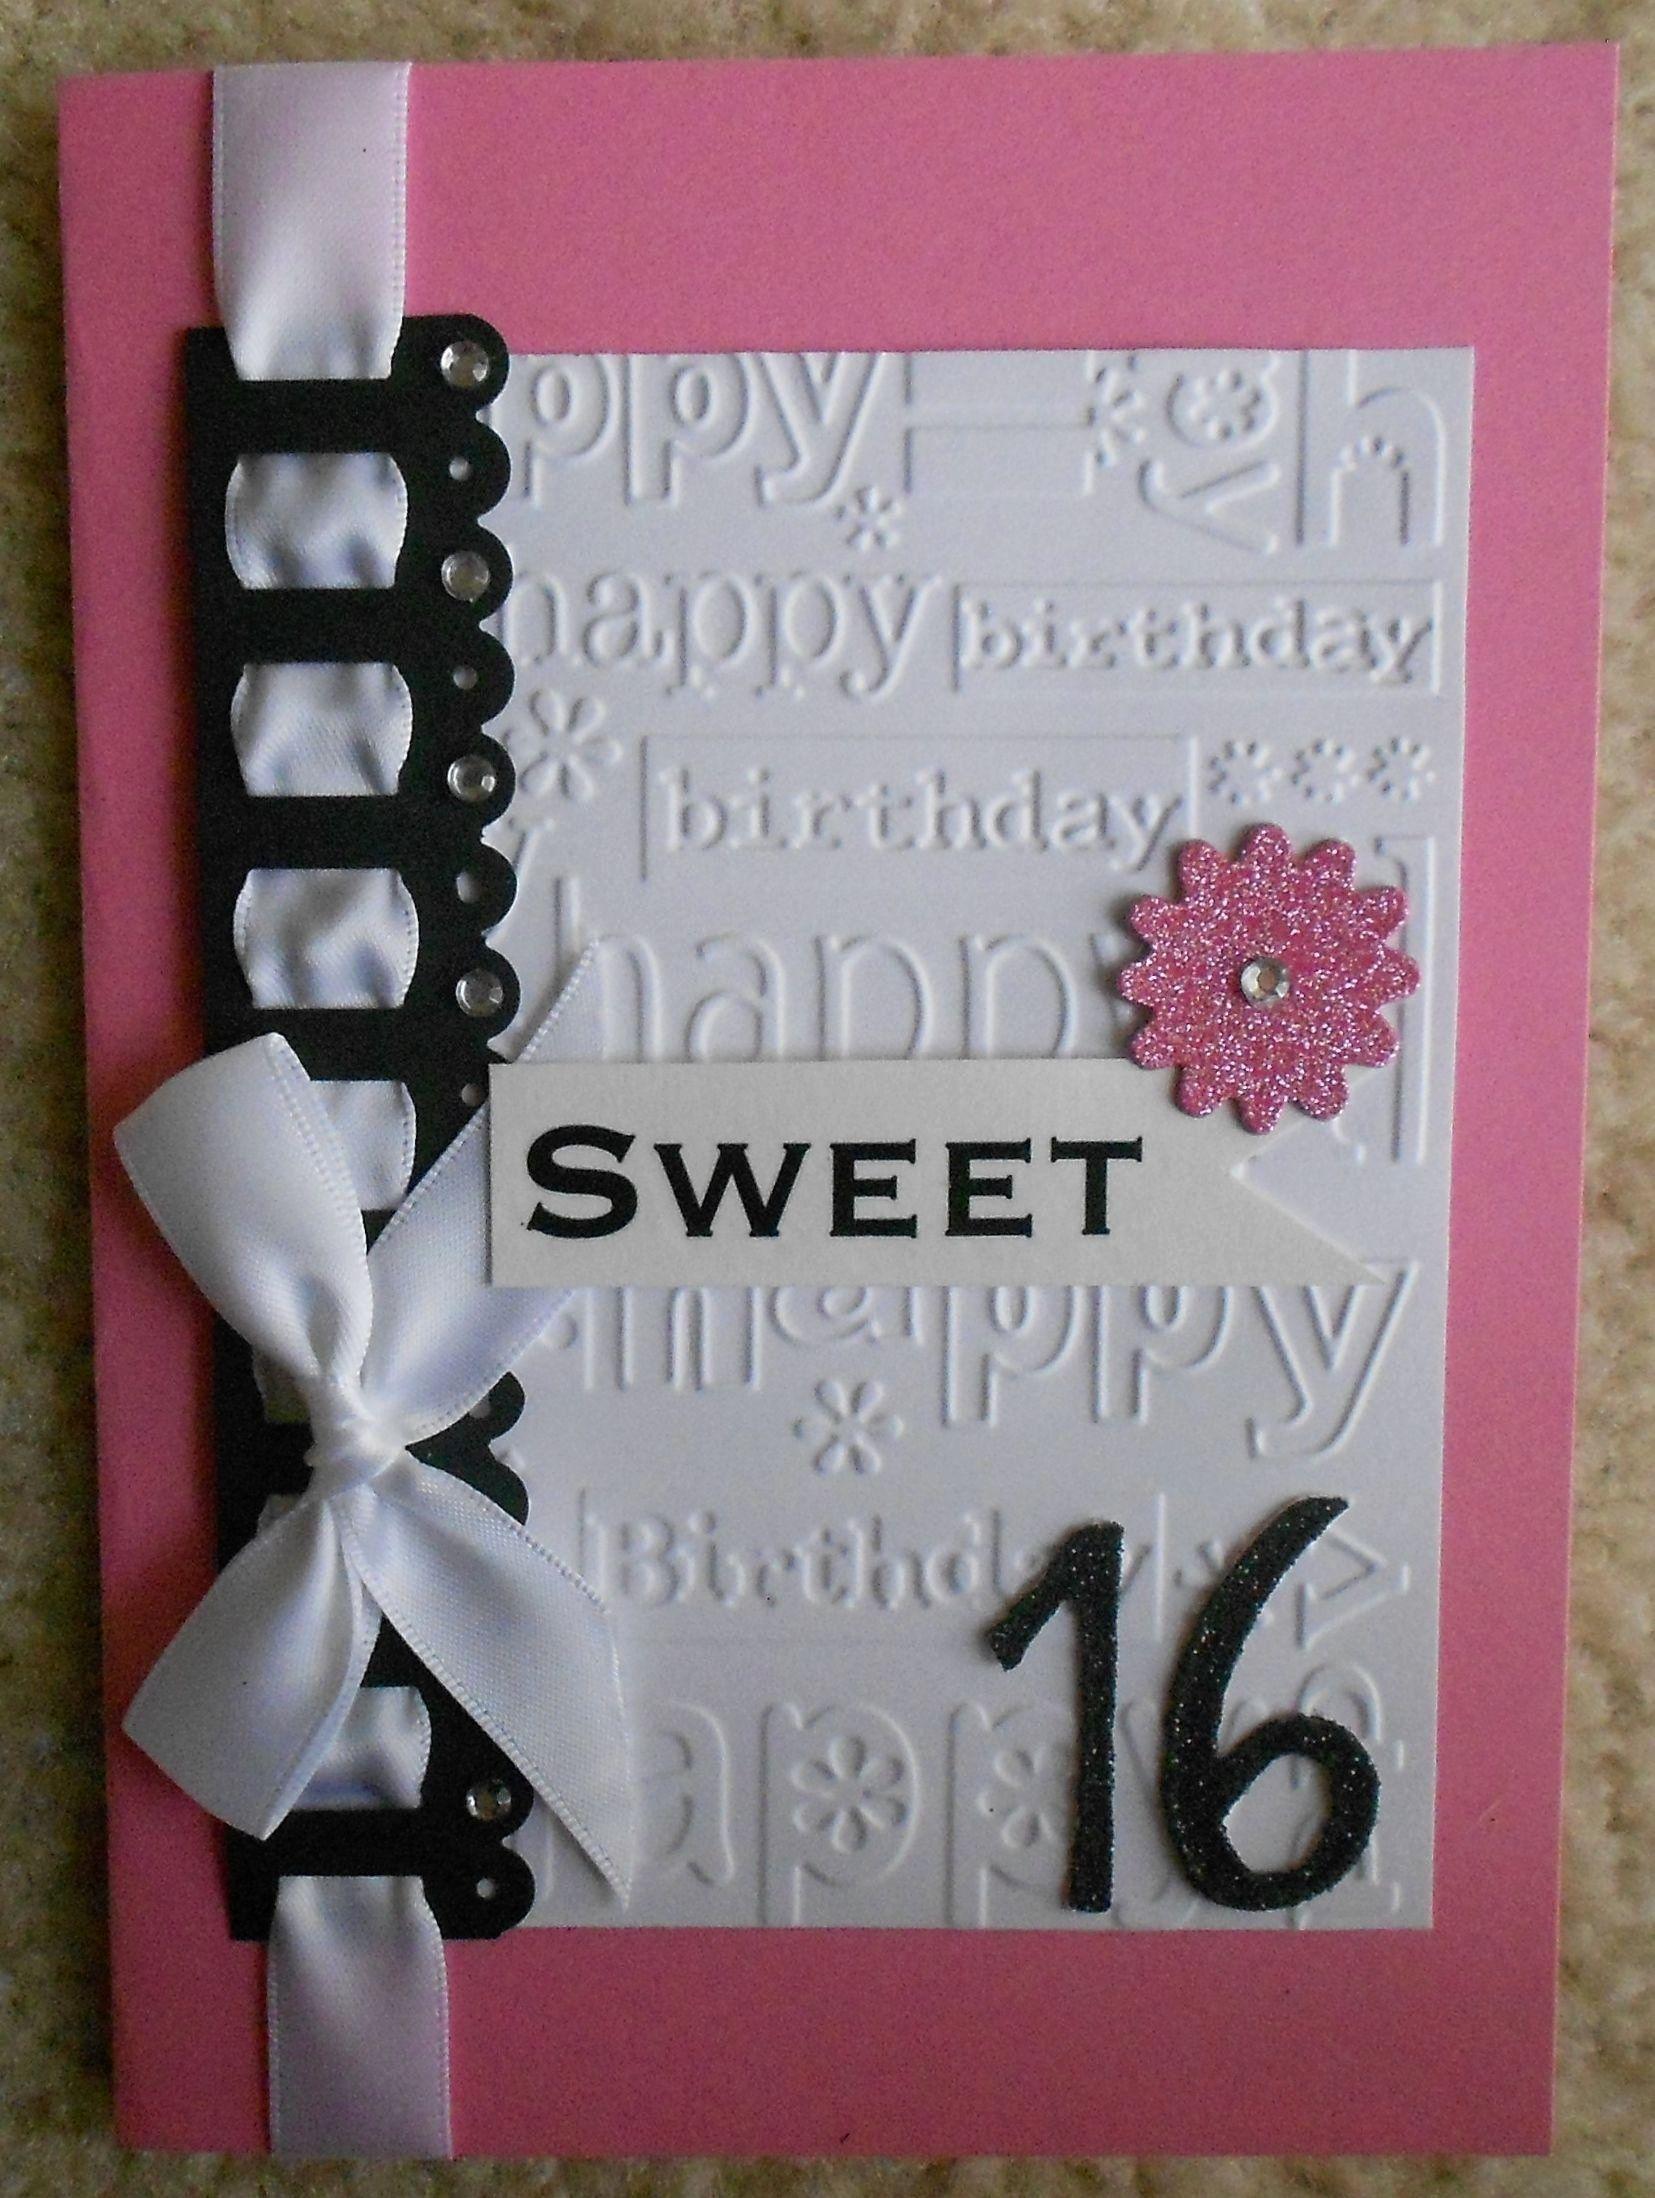 Sweet 16 Birthday Cards Printable Unique Handmade Sweet 16 Birthday Card 16th Birthday Card Birthday Card Printable Birthday Cards